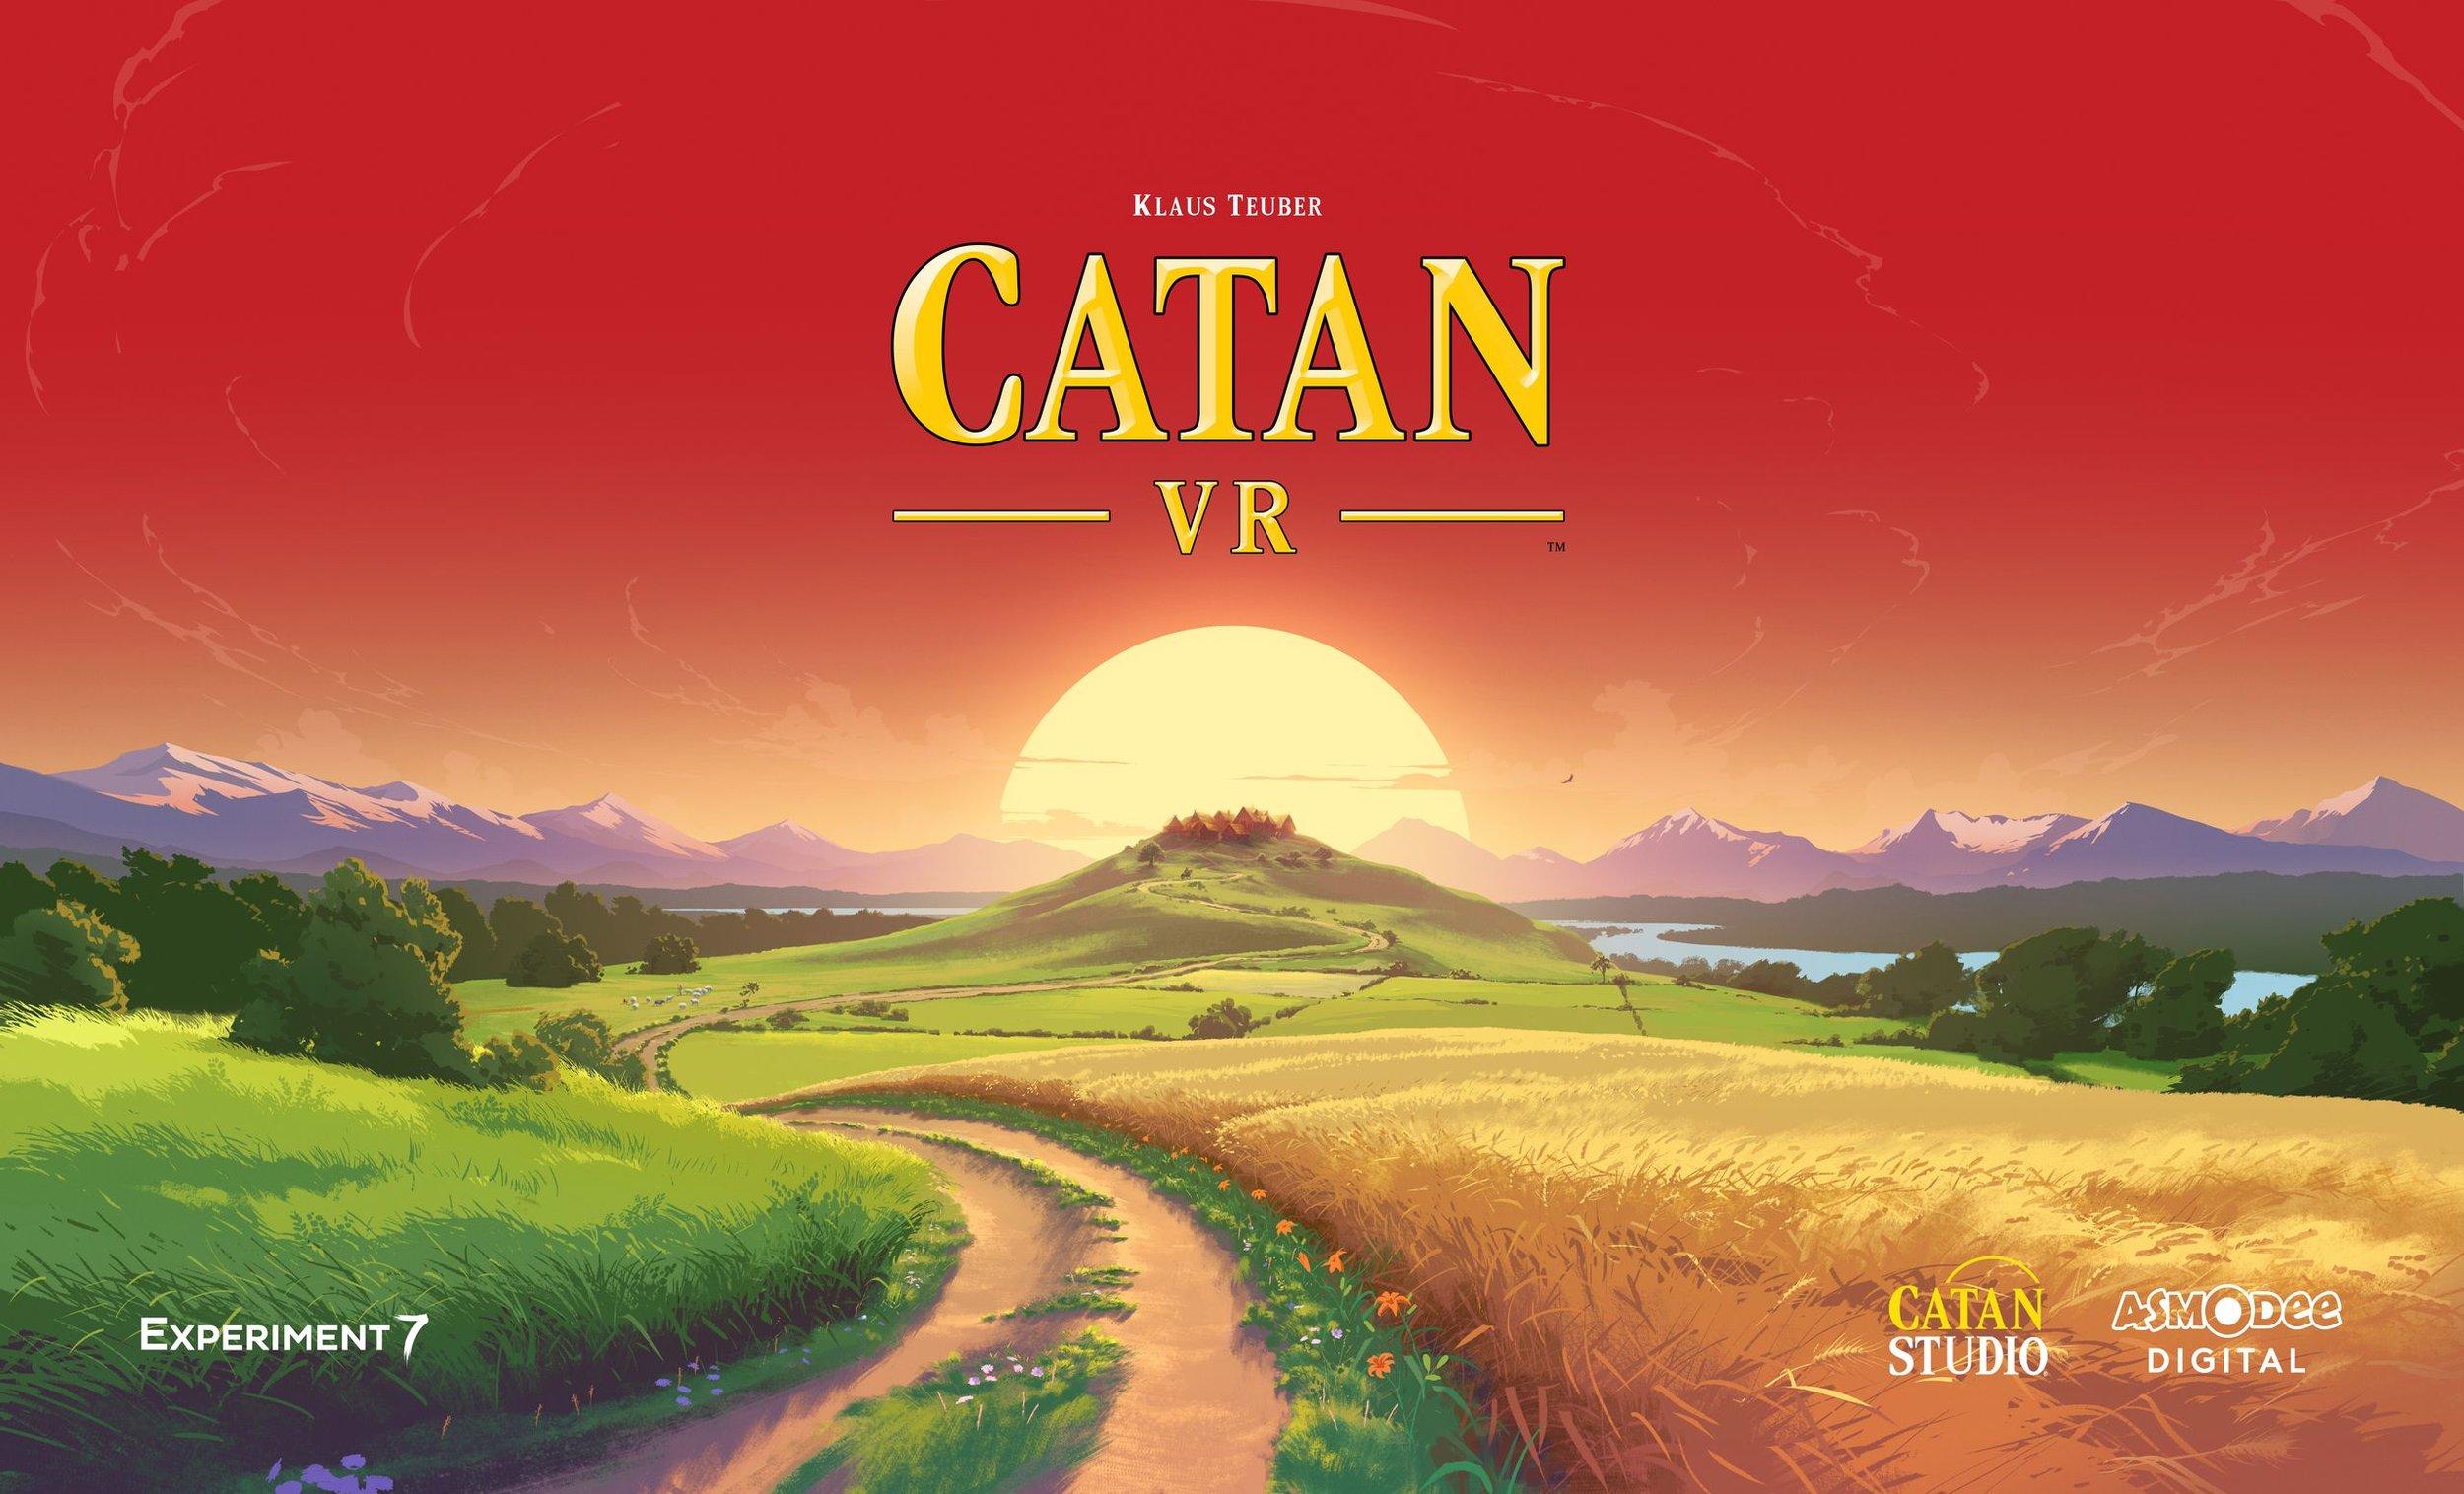 catan-promo-poster-small.jpg